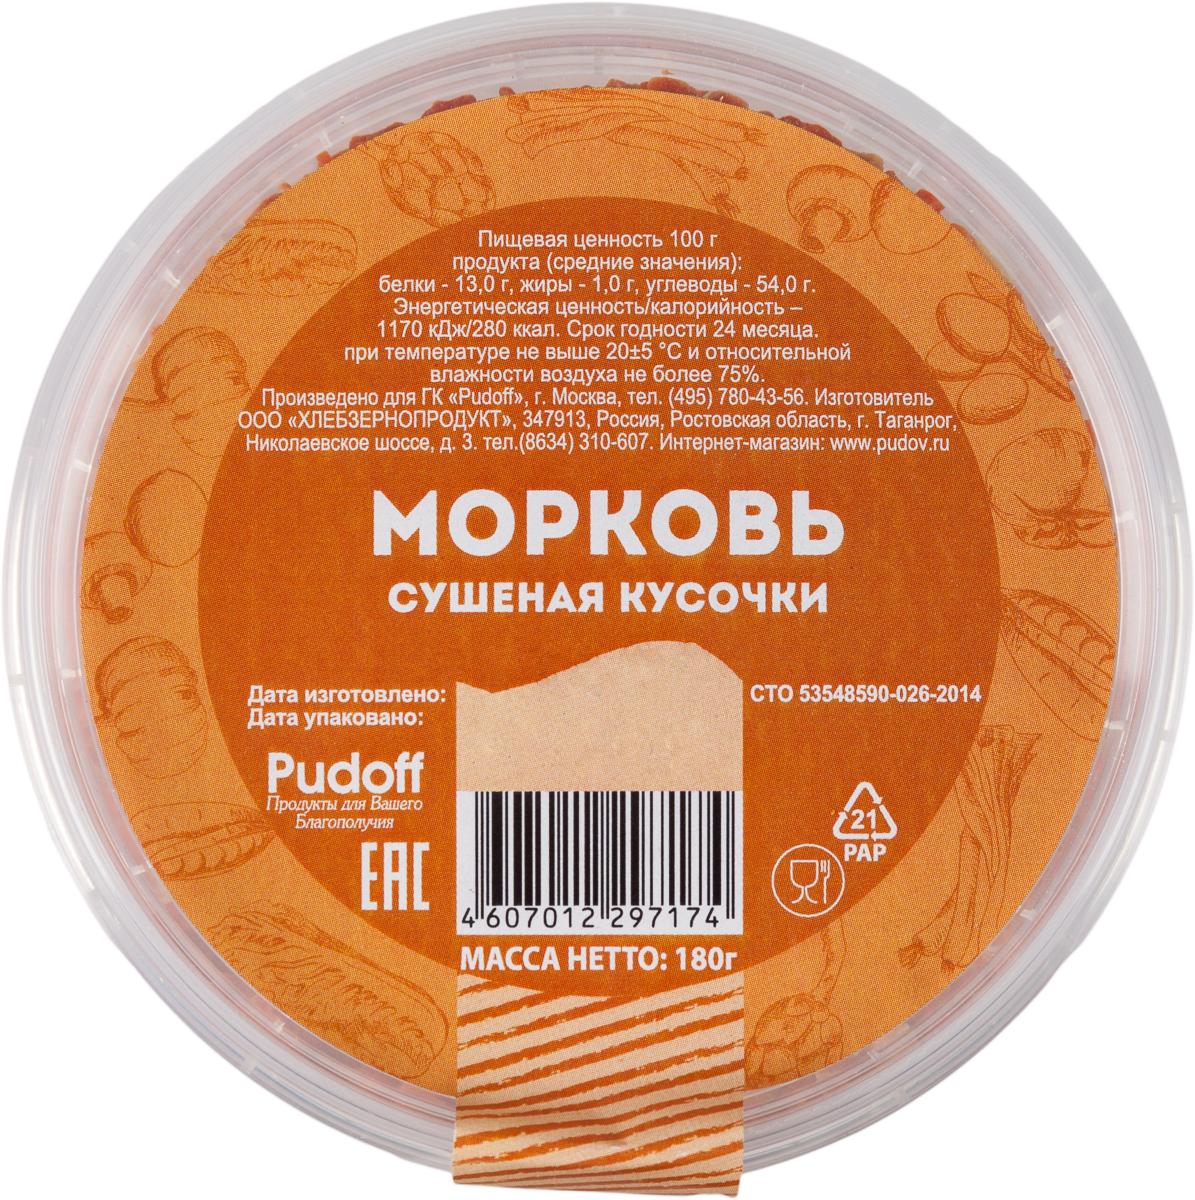 Пудовъ морковь сушеная кусочки, 180 г